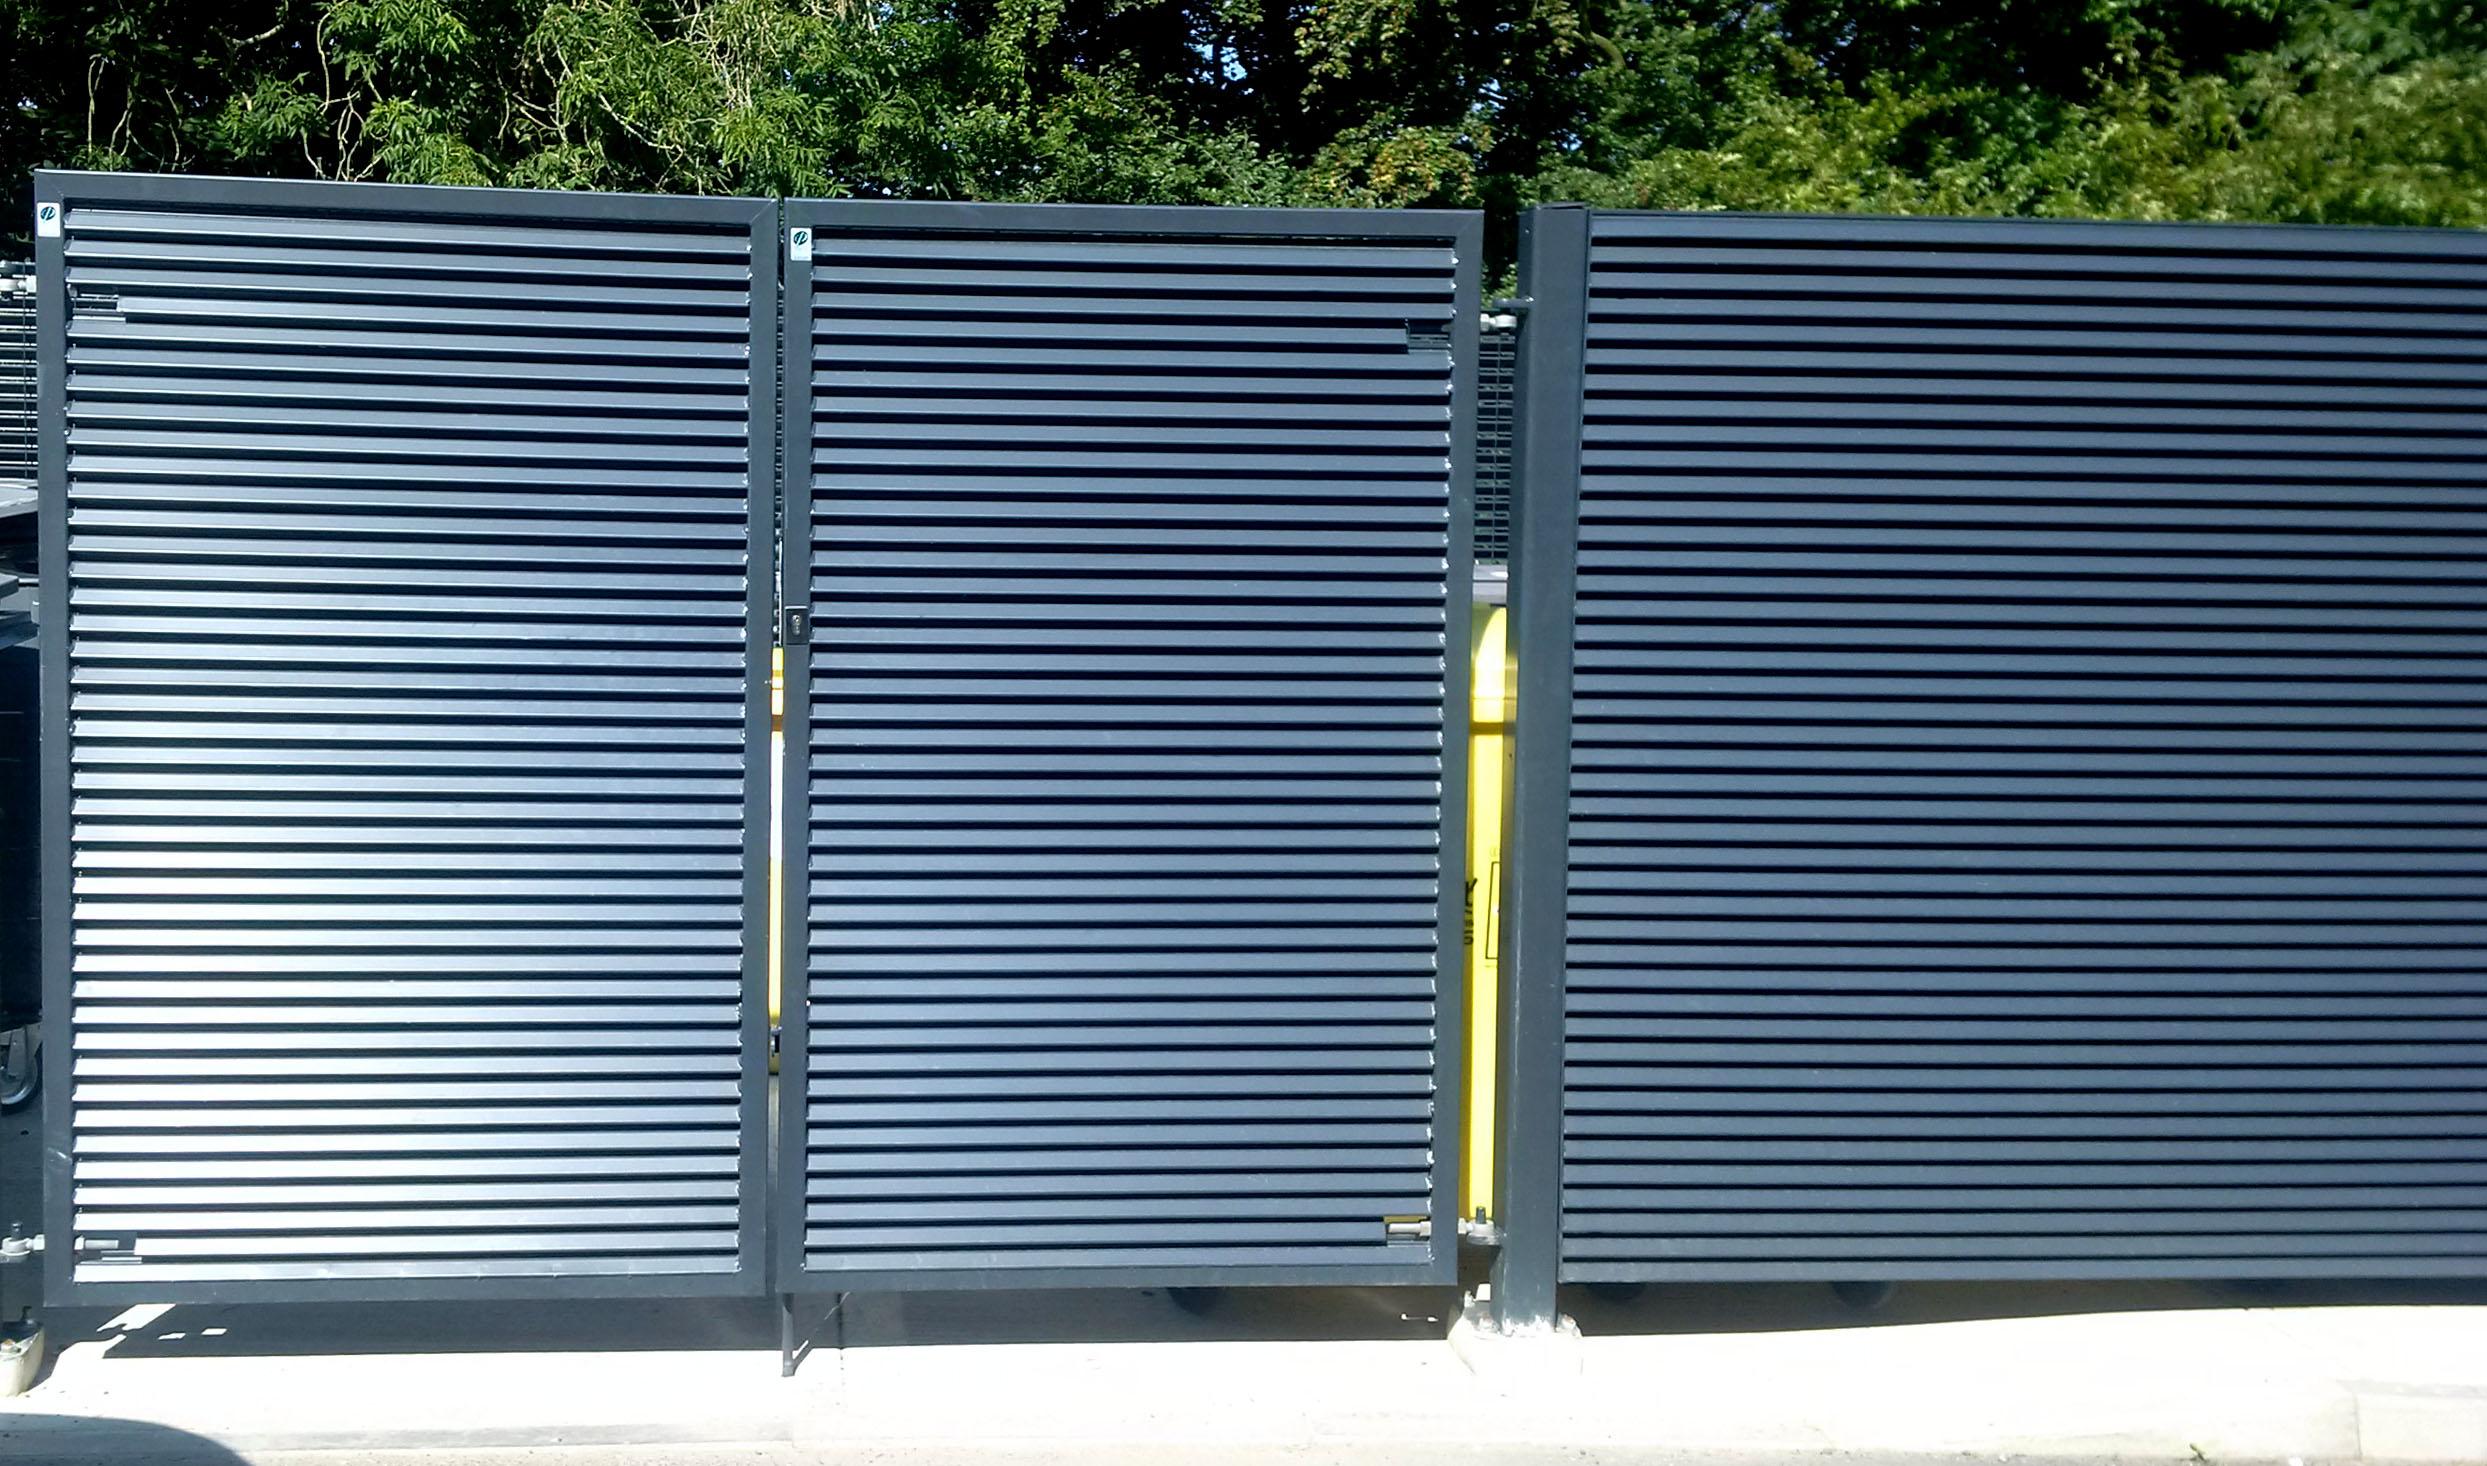 Ворота из профнастила с забором